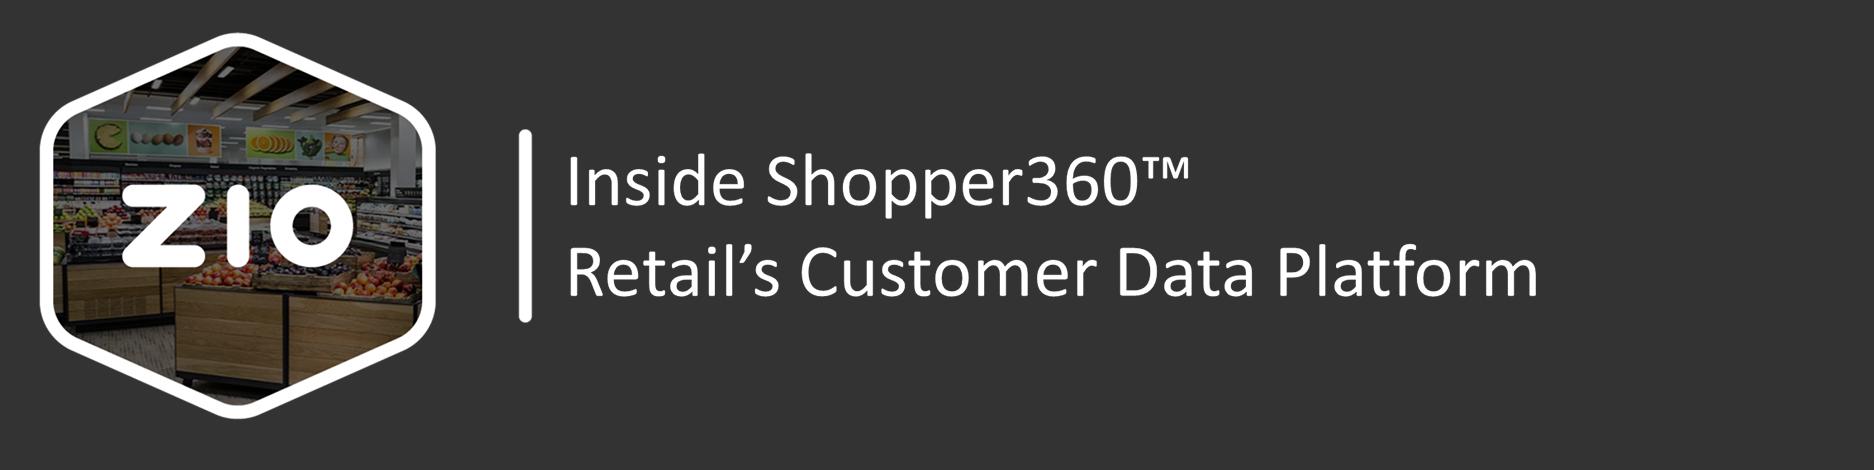 SHOPPER360 - Retail's Customer Data Platform